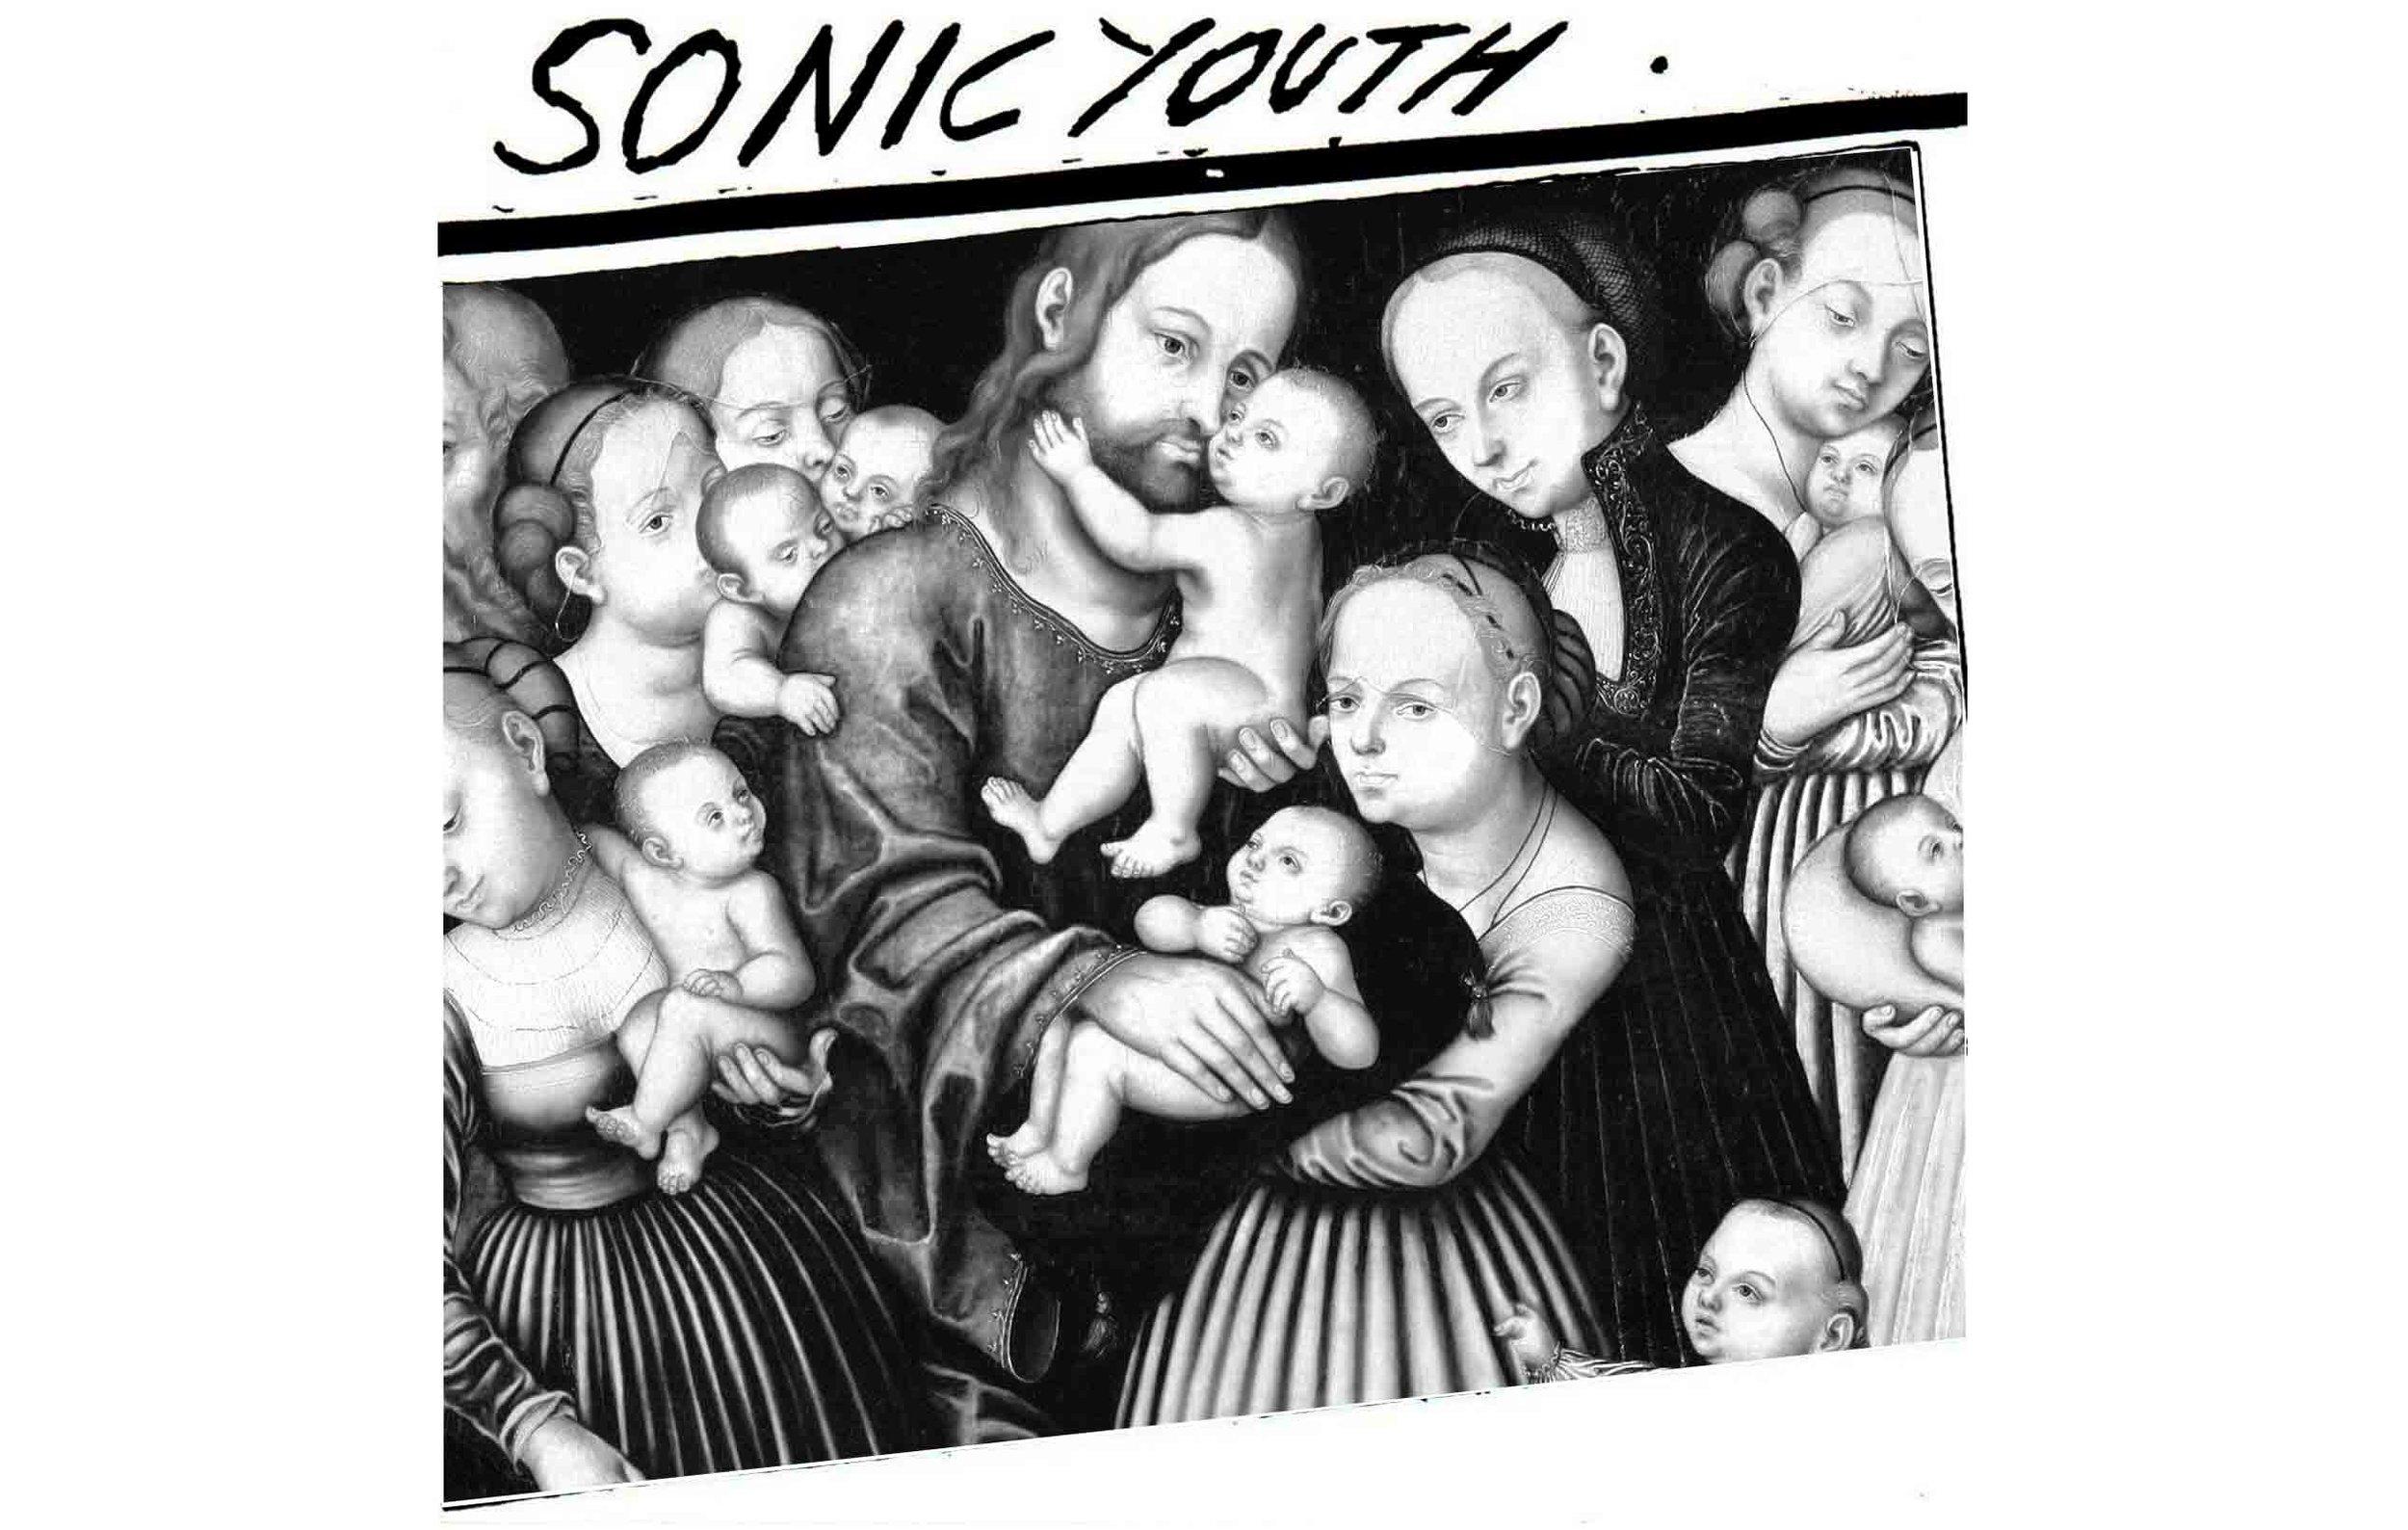 sonik youth banner.jpg